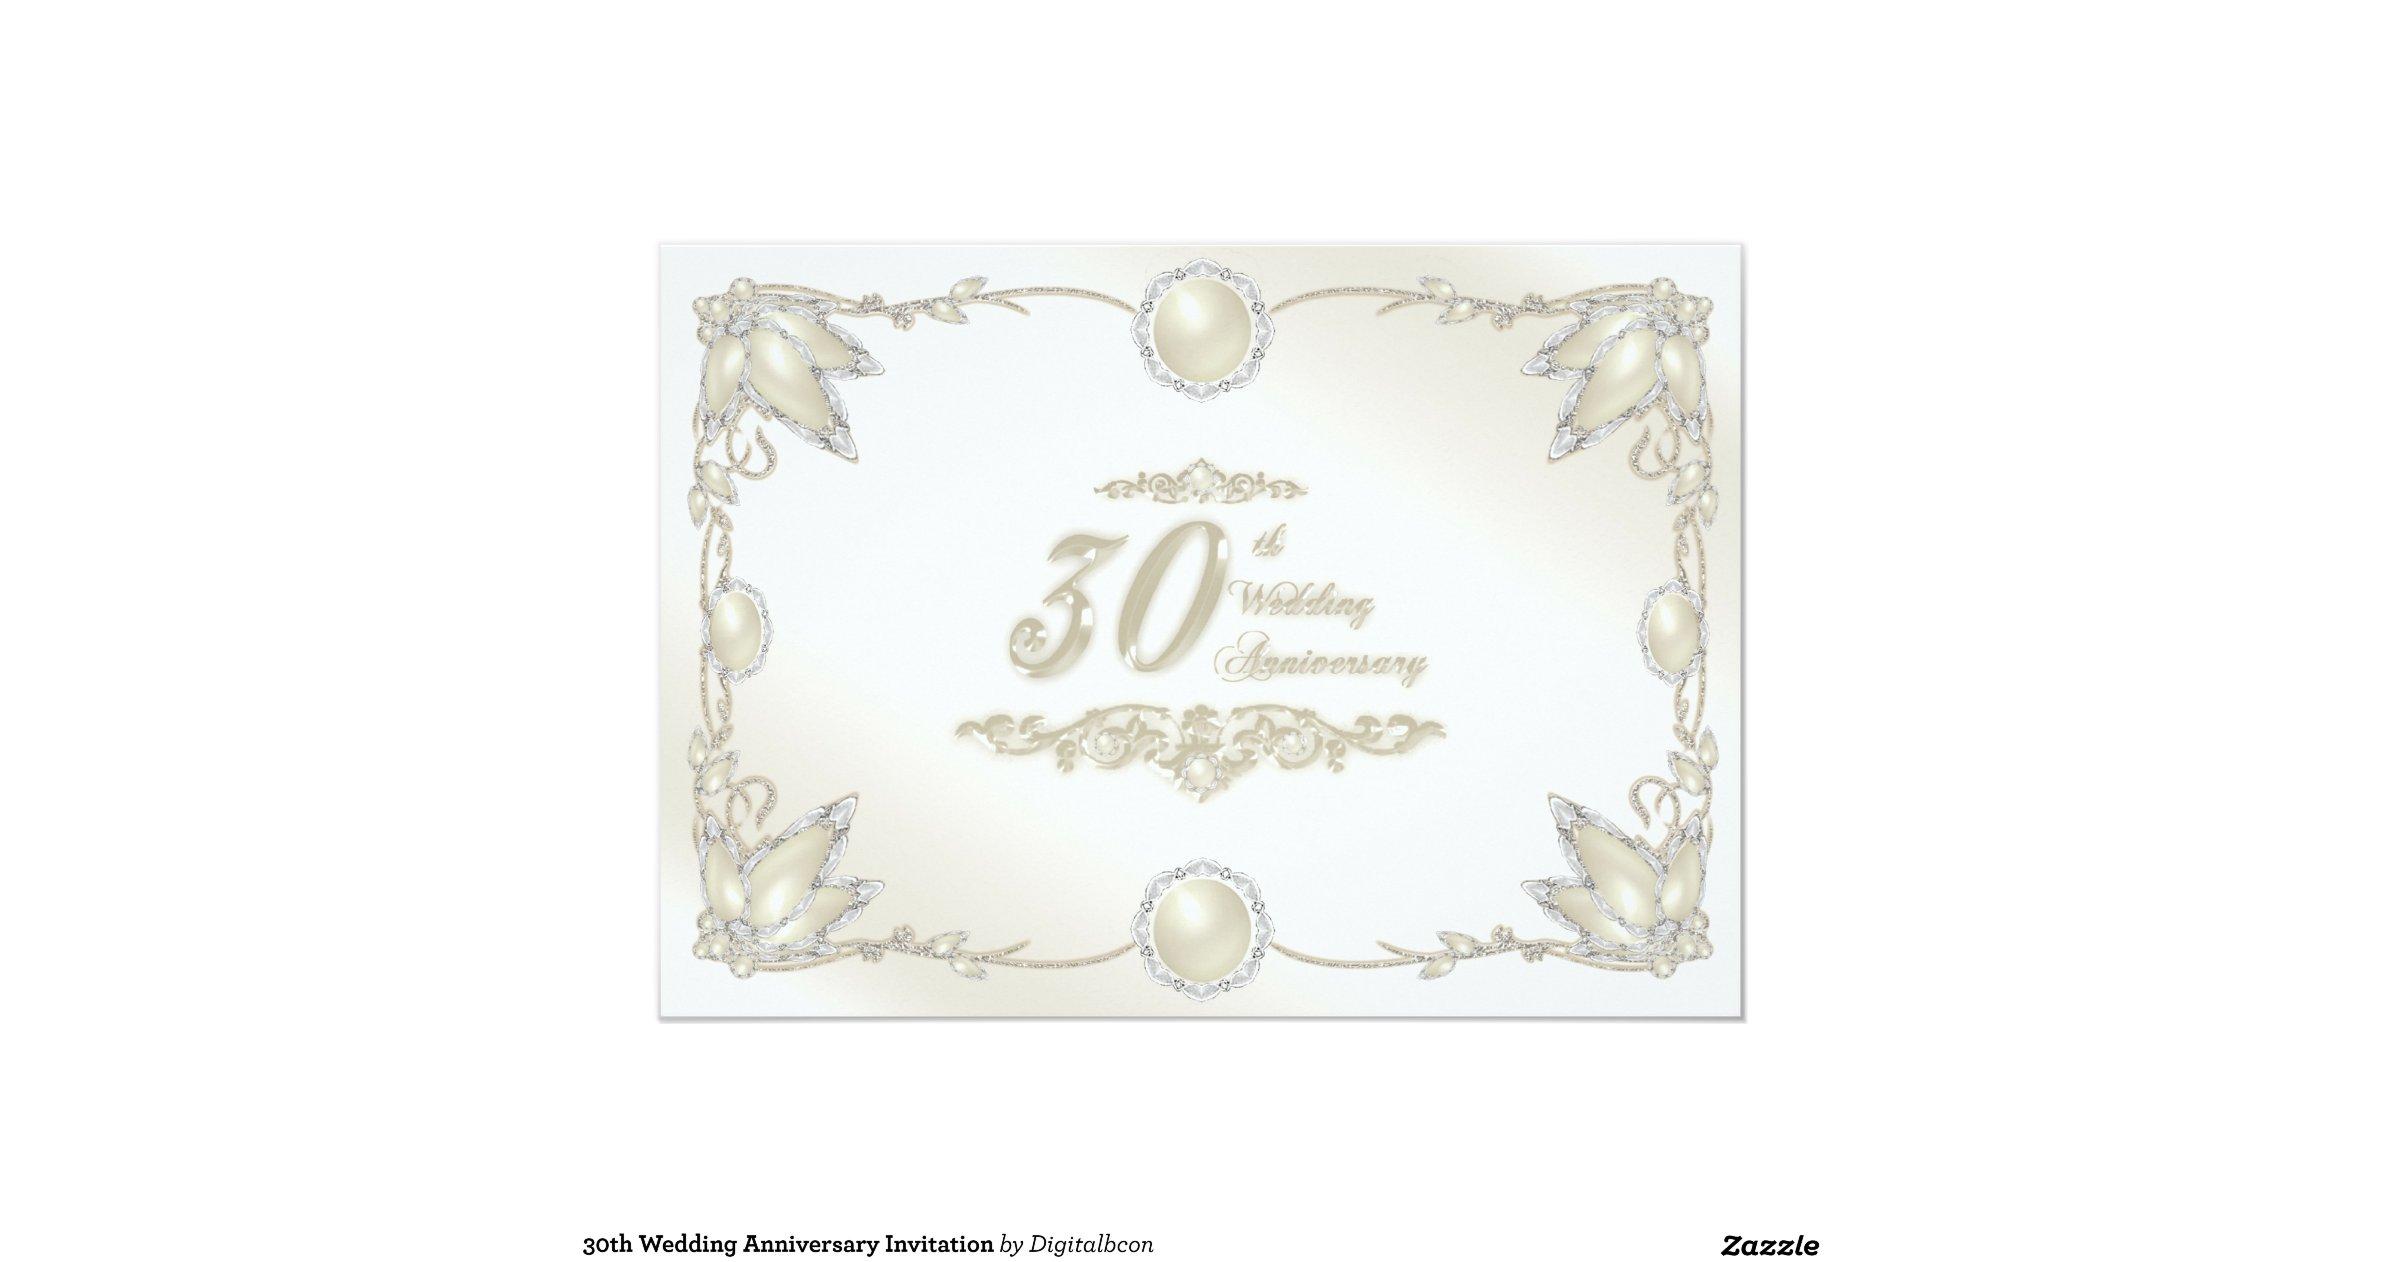 30th wedding anniversary invitations - 28 images - 800 30th wedding ...